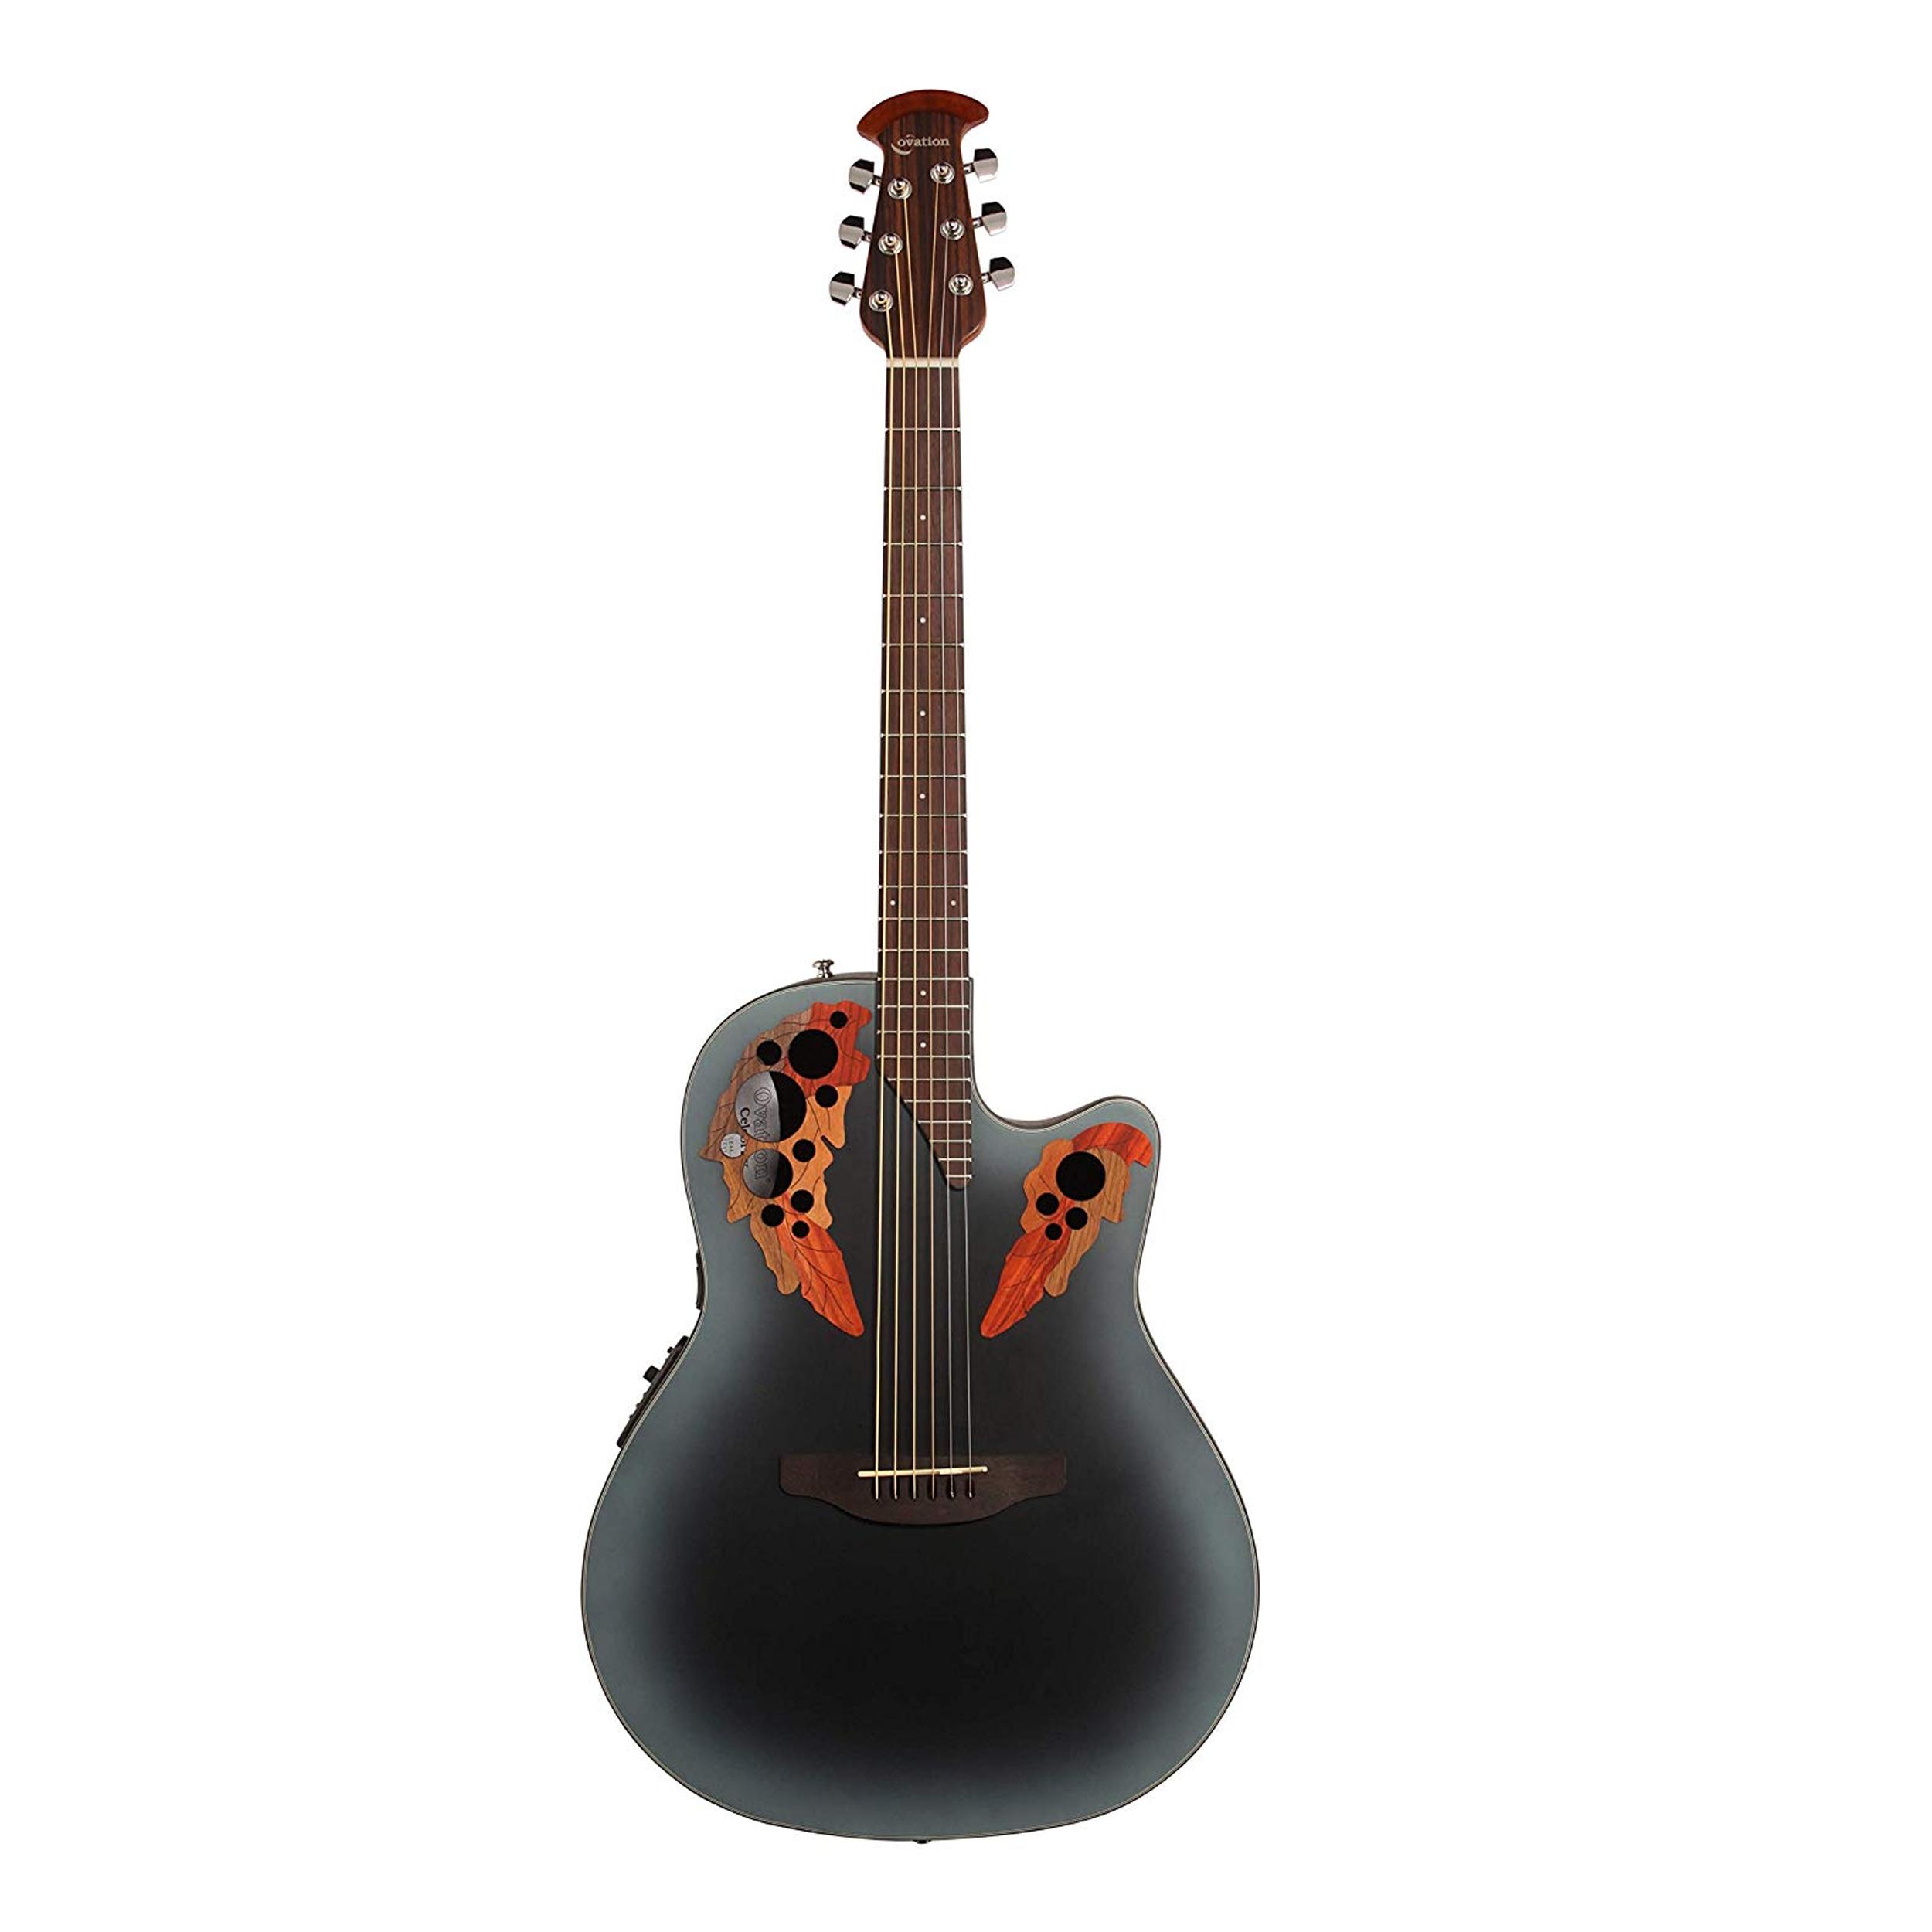 Blue Burst Guitars : ovation celebrity elite mid depth acoustic electric guitar reverse blue burst ebay ~ Vivirlamusica.com Haus und Dekorationen